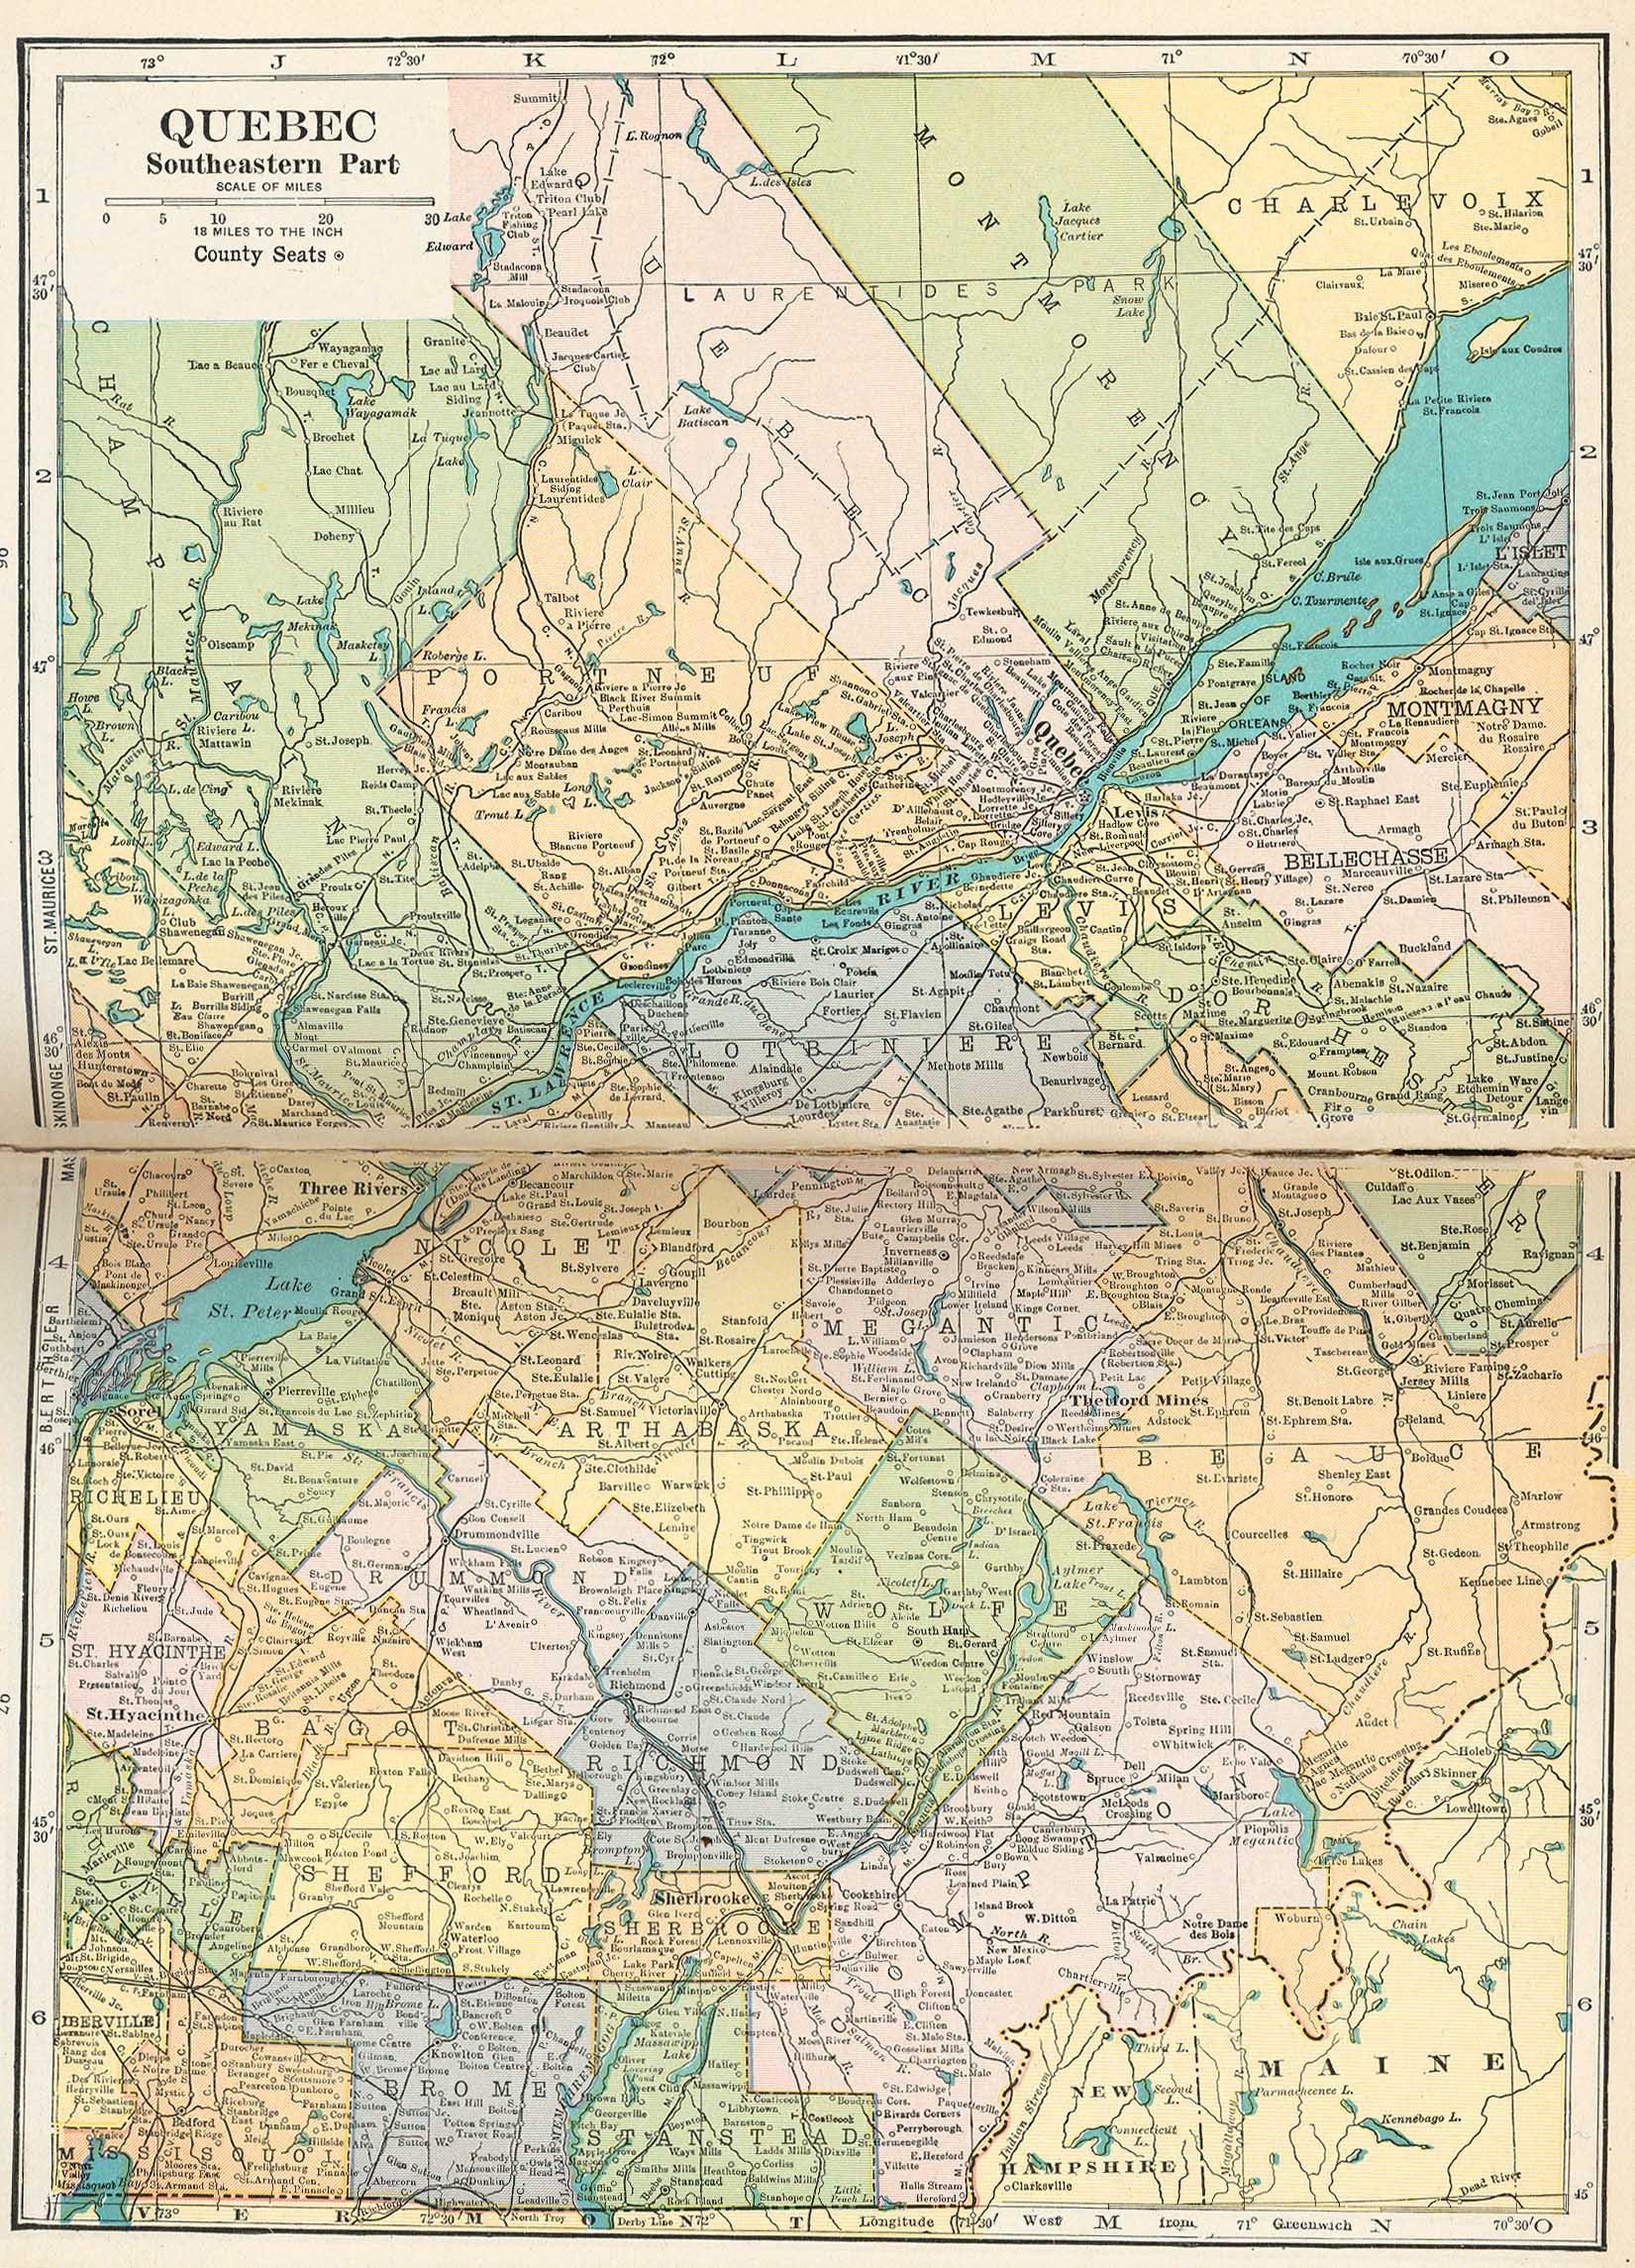 Southeastern Quebec Map, Canada 1921